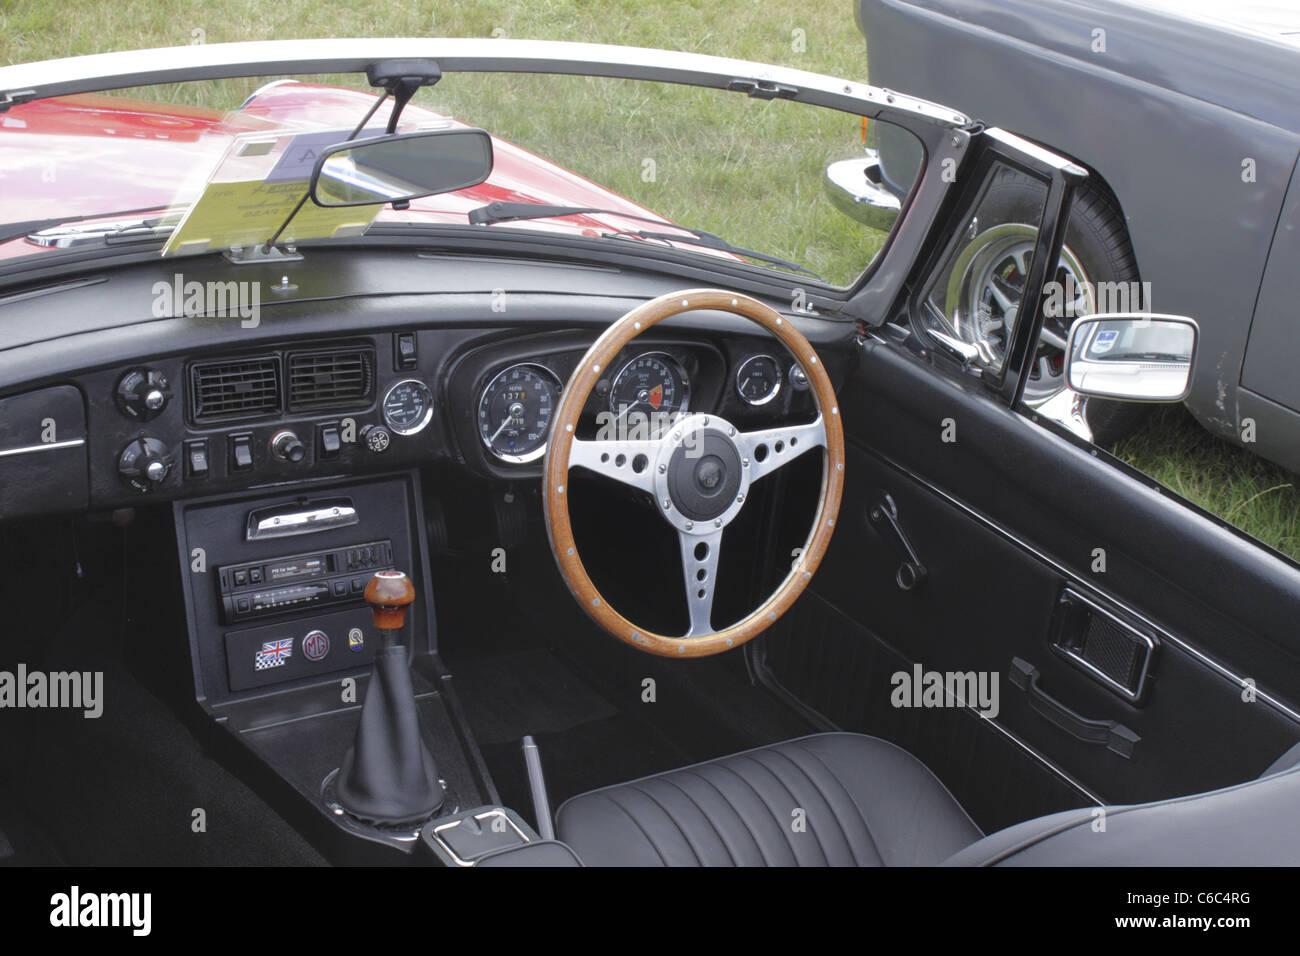 Mg Mgb Roadster Stockfotos & Mg Mgb Roadster Bilder - Alamy